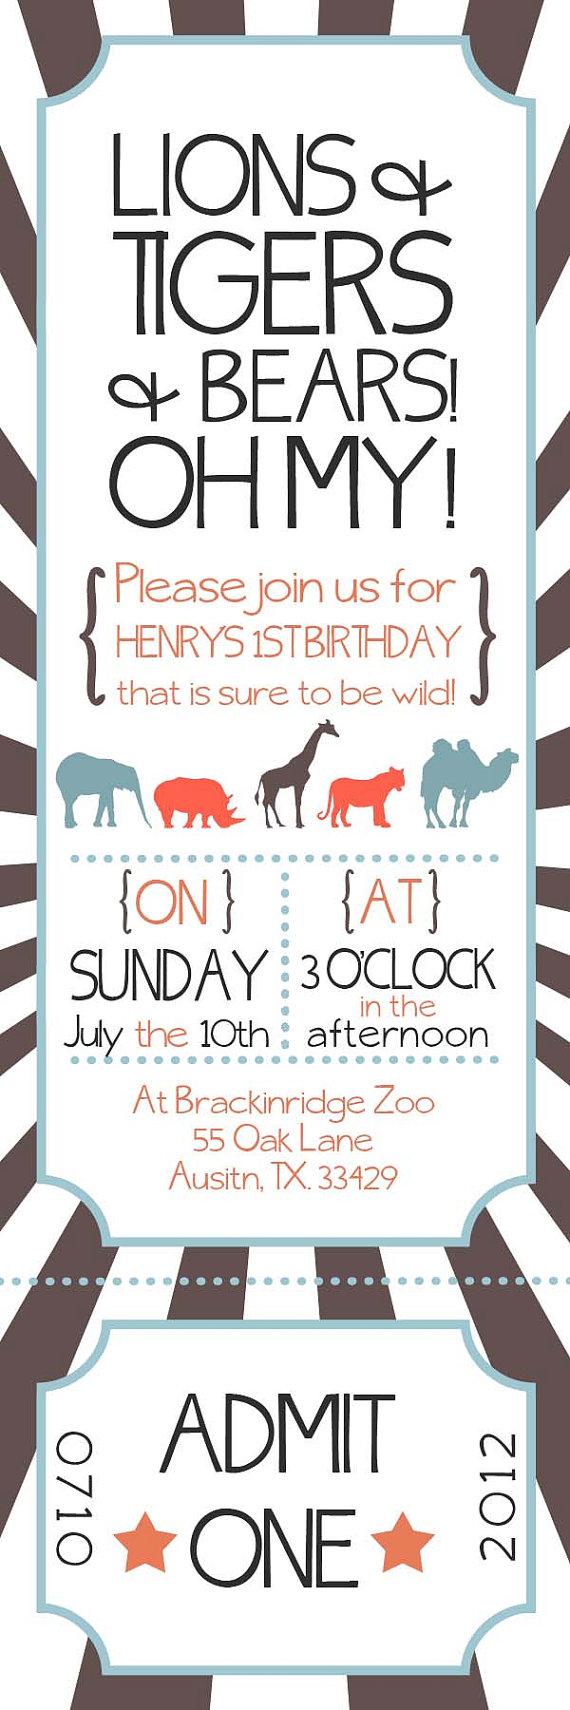 Zoo ticket birthday party invitation by withlovegreetings on etsy zoo ticket birthday party invitation by withlovegreetings on etsy 1500 stopboris Gallery